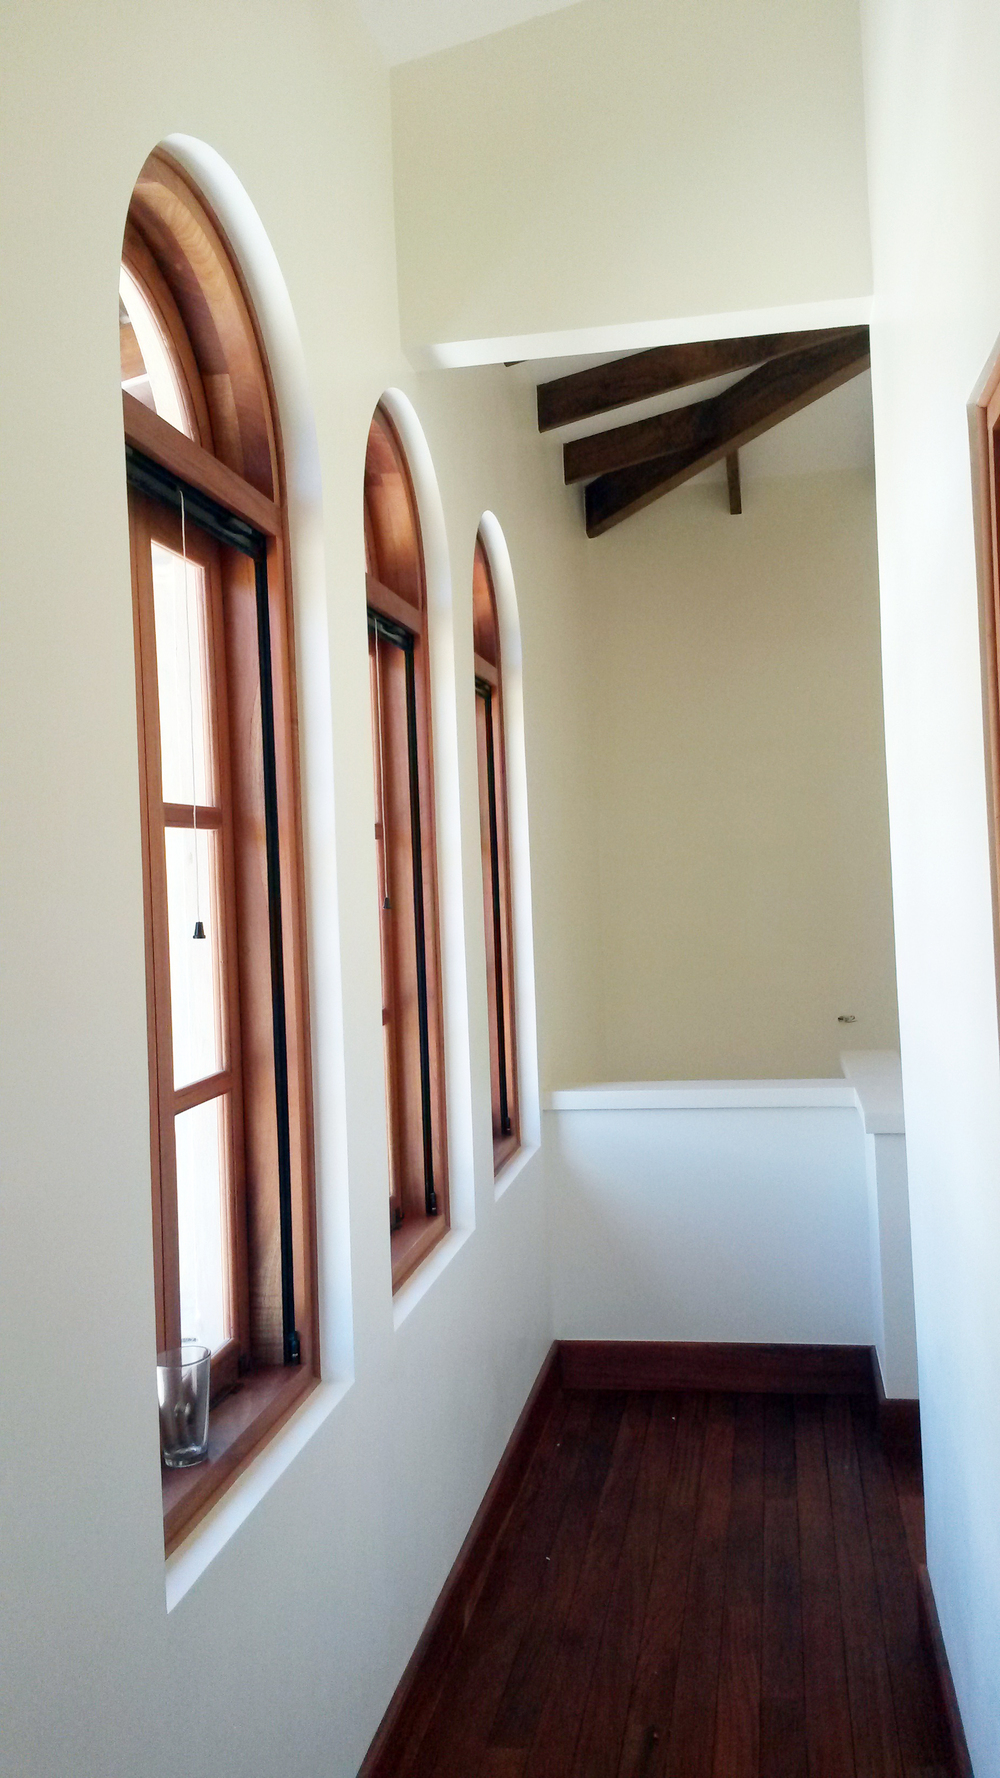 Guanacaste.Costa_Rica.Las_Catalinas.14_Calle_La_Ronda.Robert_Orr_&_Associates.Architecture.Landscape_Architecture.New_Urbanism.Hall2.jpg